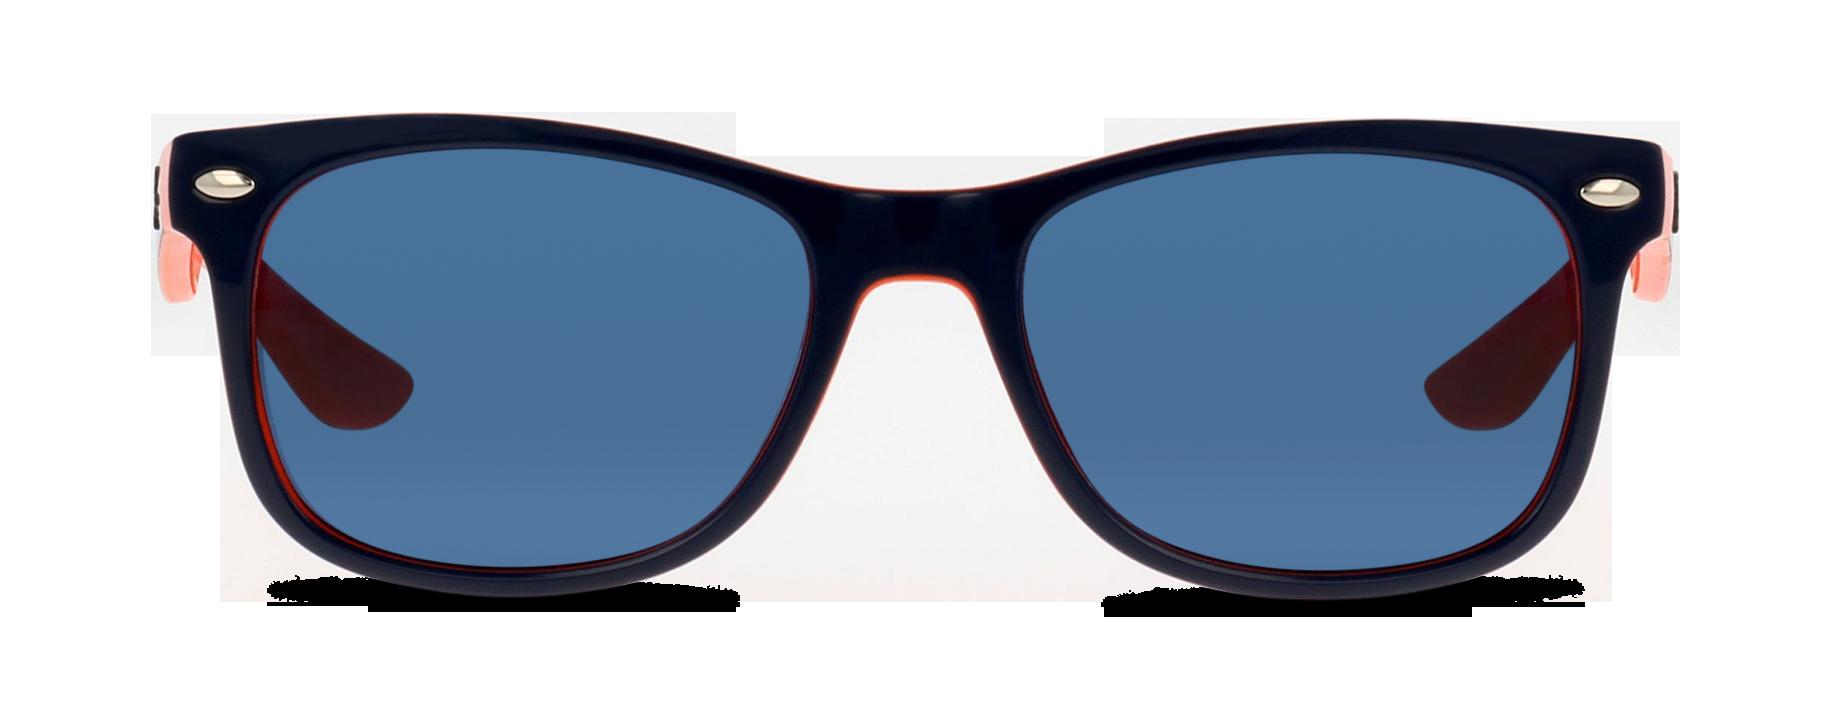 Front Ray-Ban Ray-Ban 9052S 178/80 48/16 Blauw, Oranje/Blauw